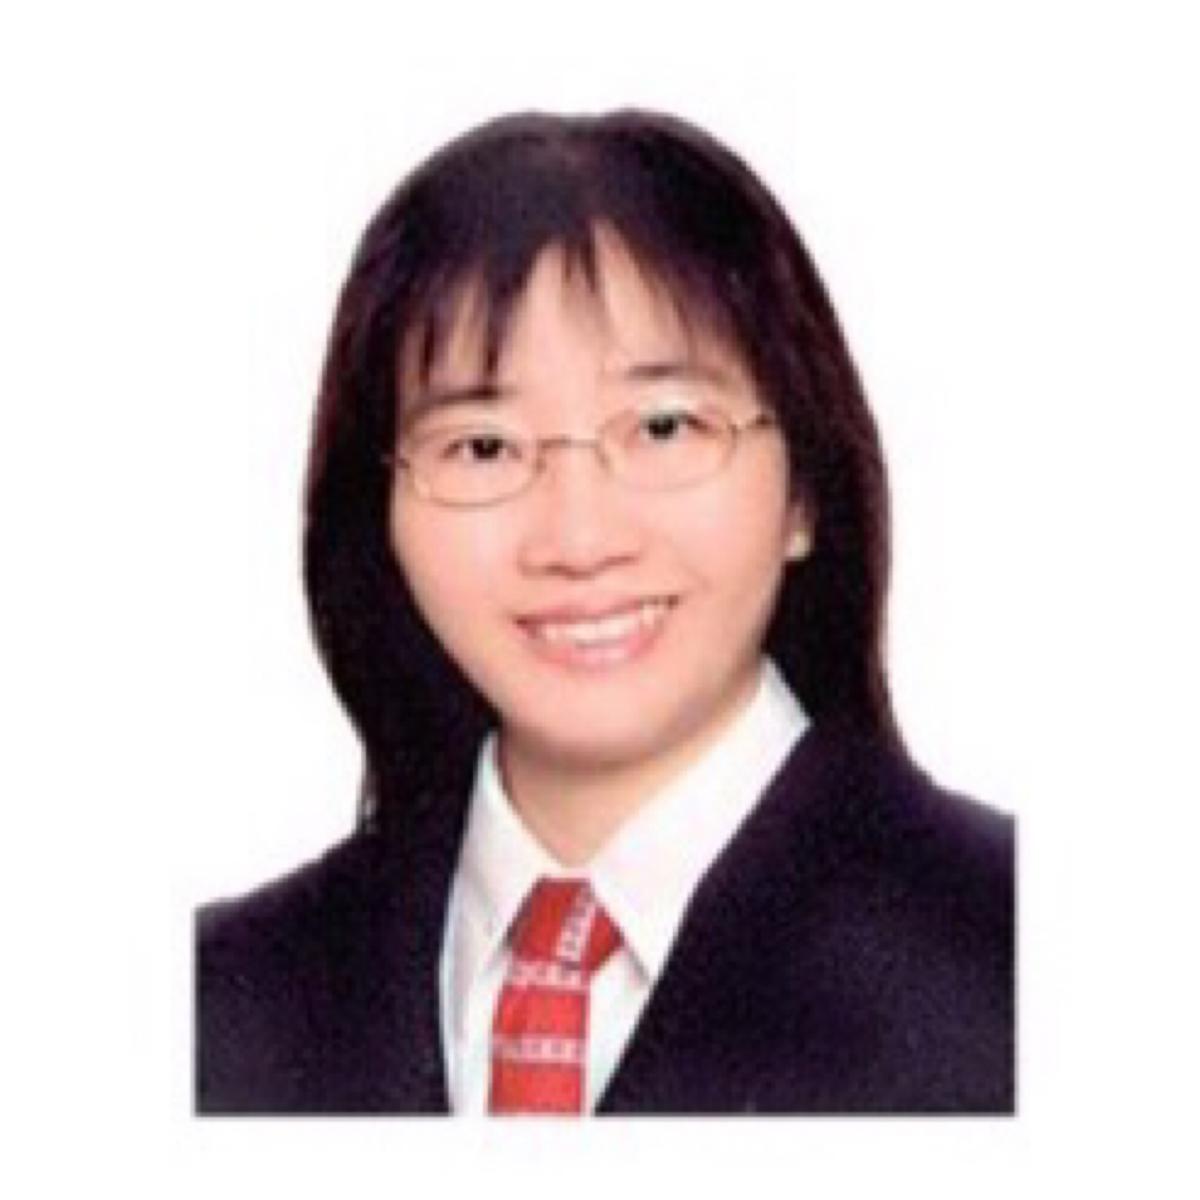 Jane Lau 08 R027742A 96715821